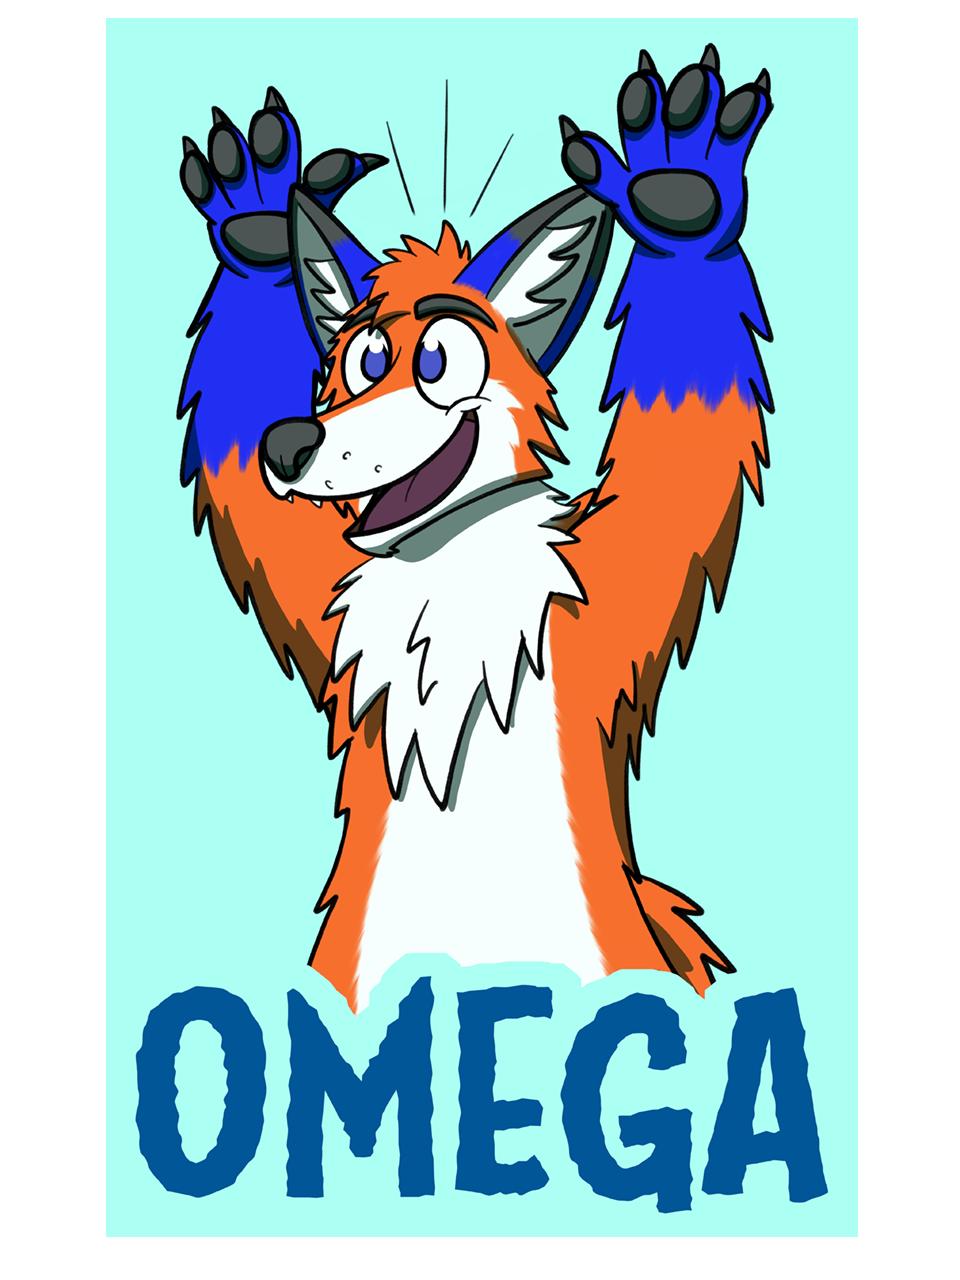 MFF 2018 badge commission for Omega814!